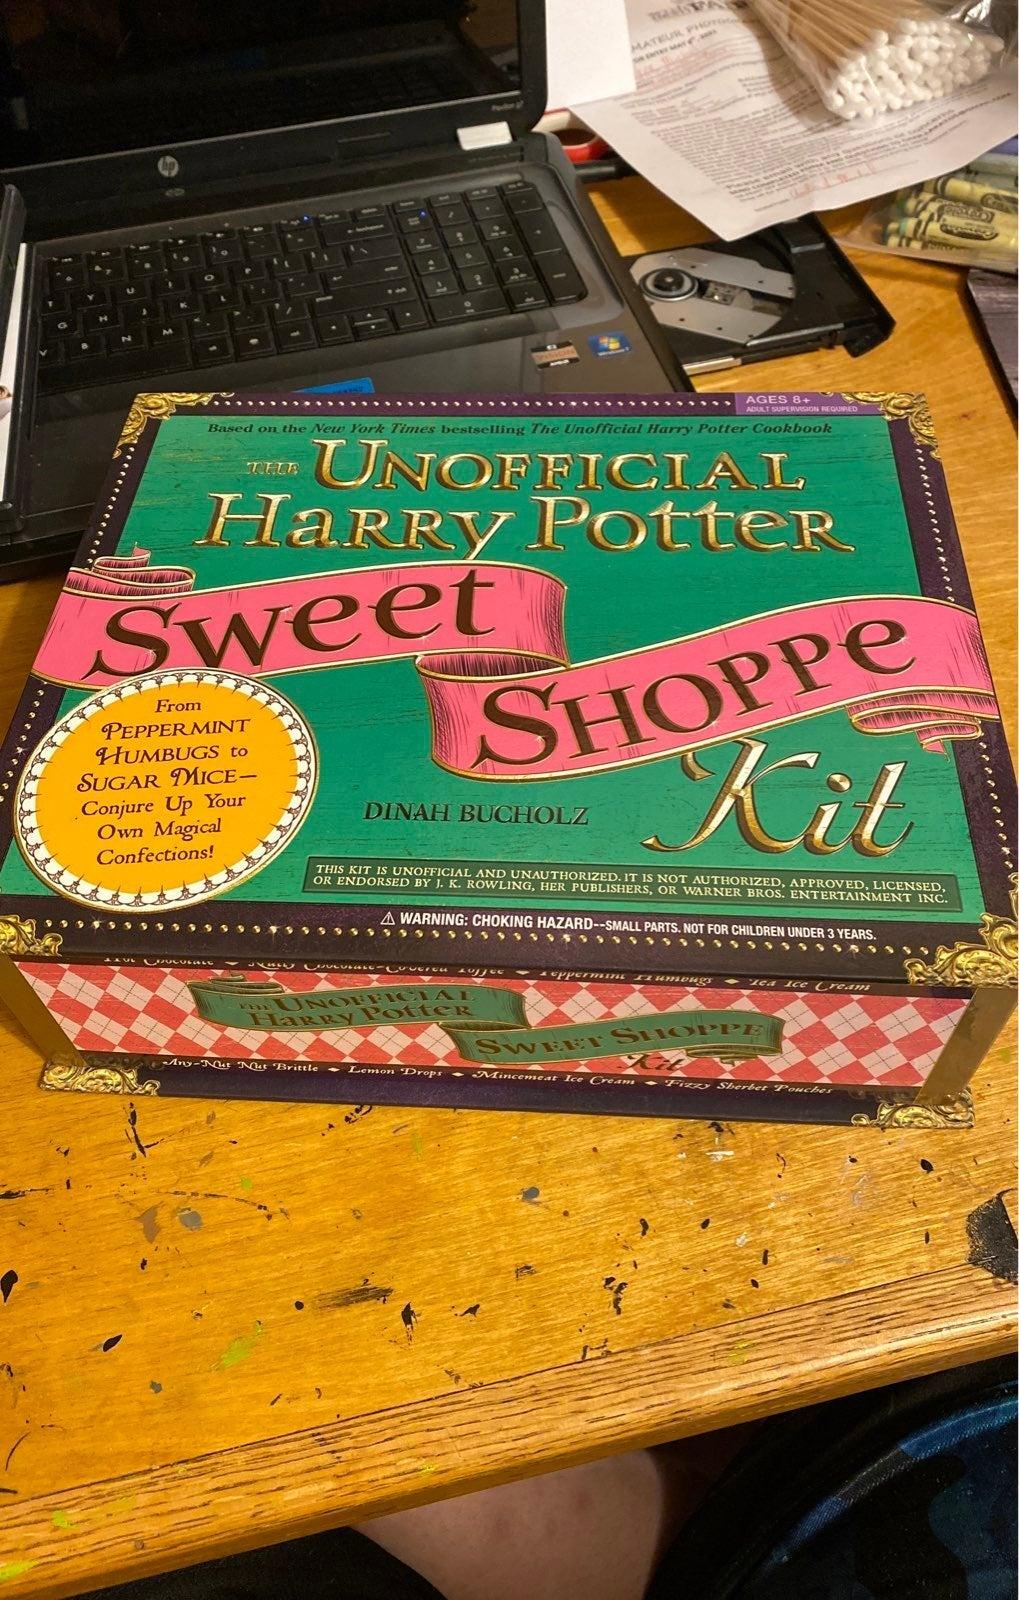 Harry Potter Sweet Shoppe